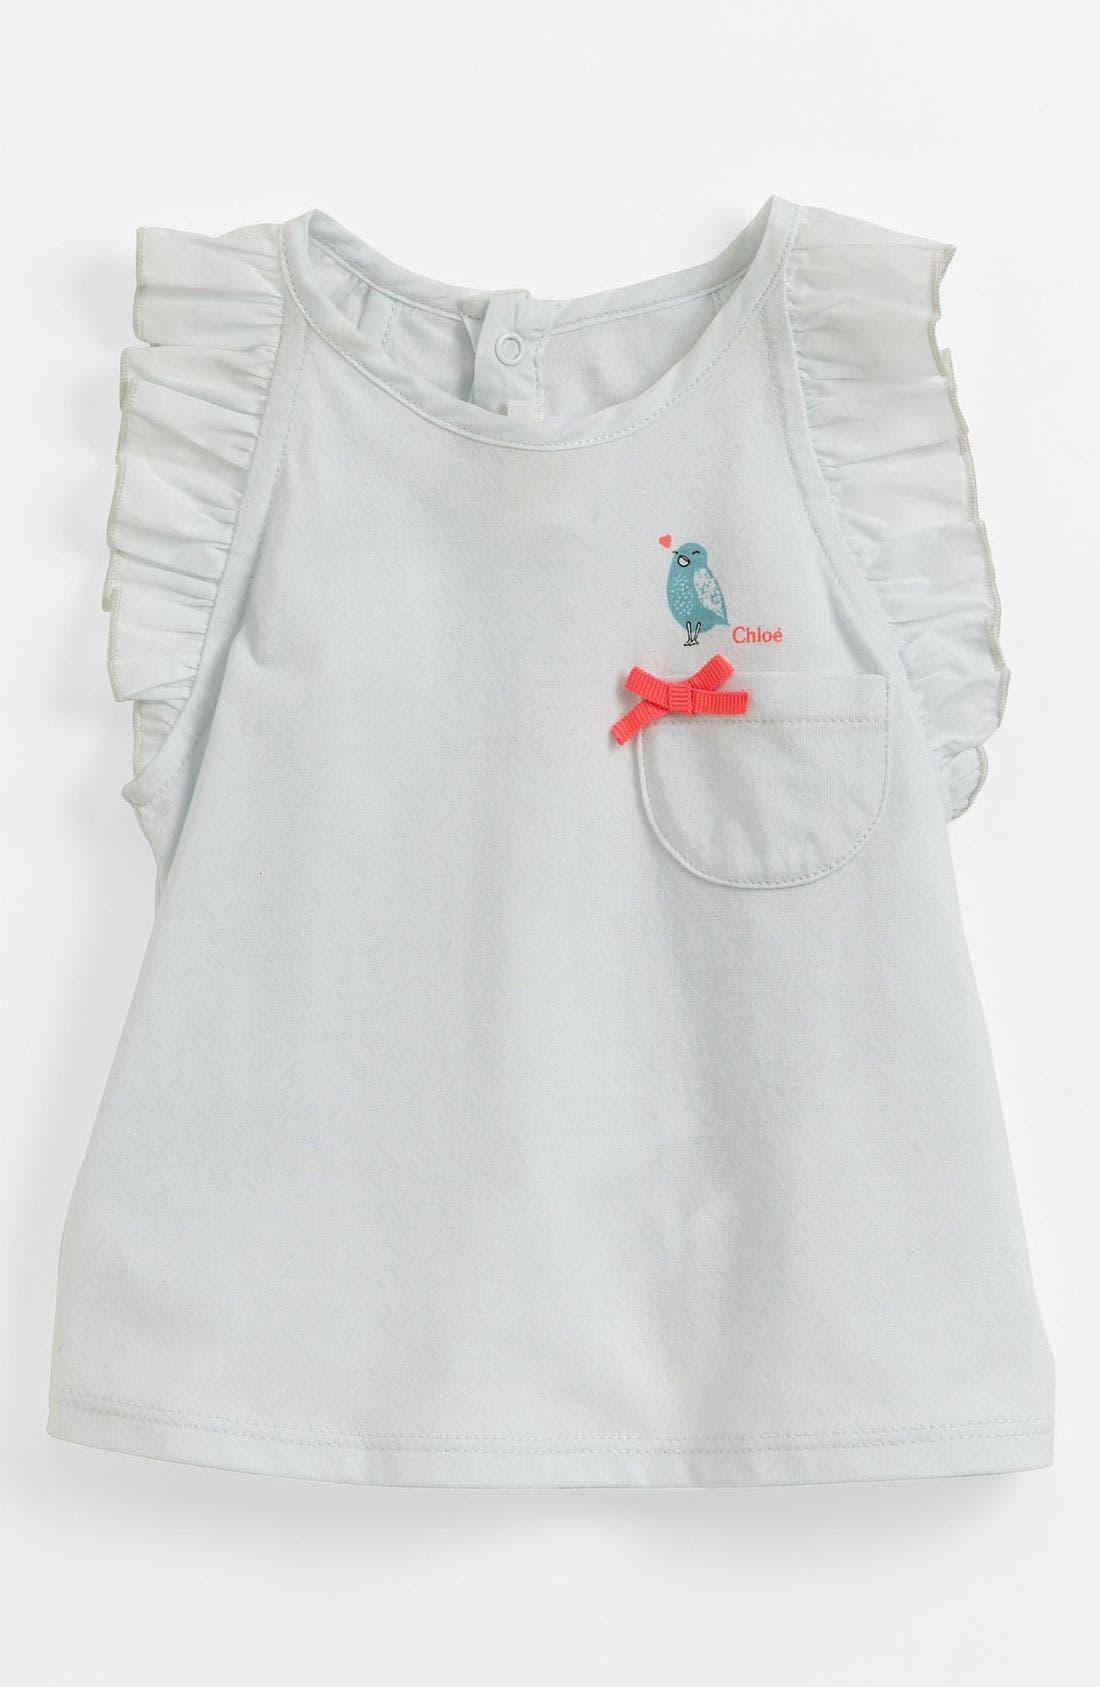 Main Image - Chloé Ruffle Sleeve Tank Top (Baby)